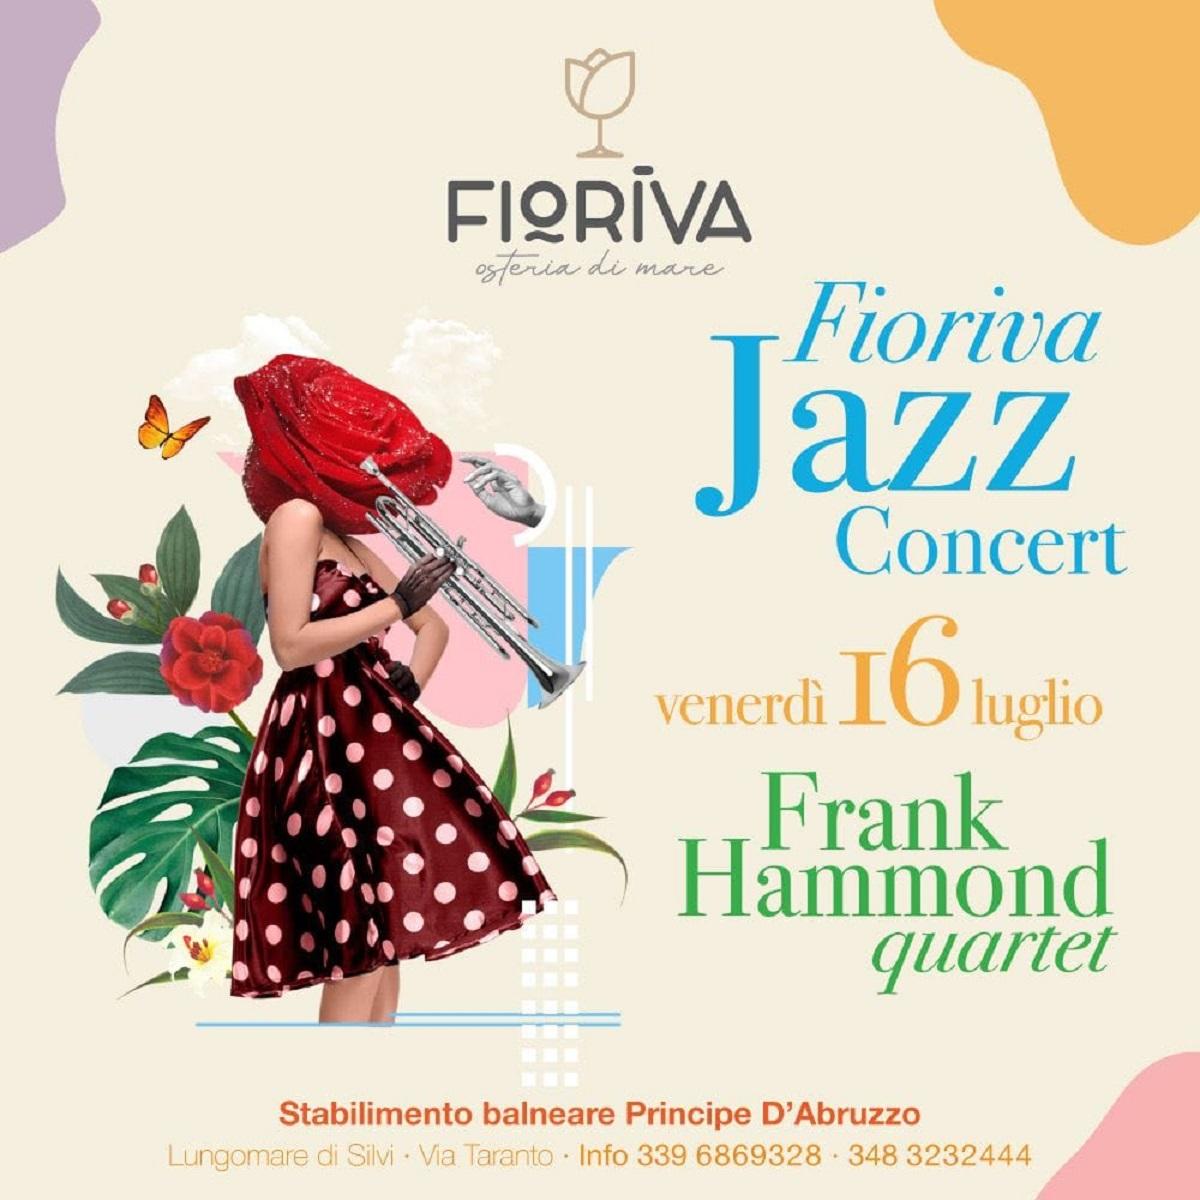 Fioriva Jazz Concert venerdì 16 luglio 2021 foto